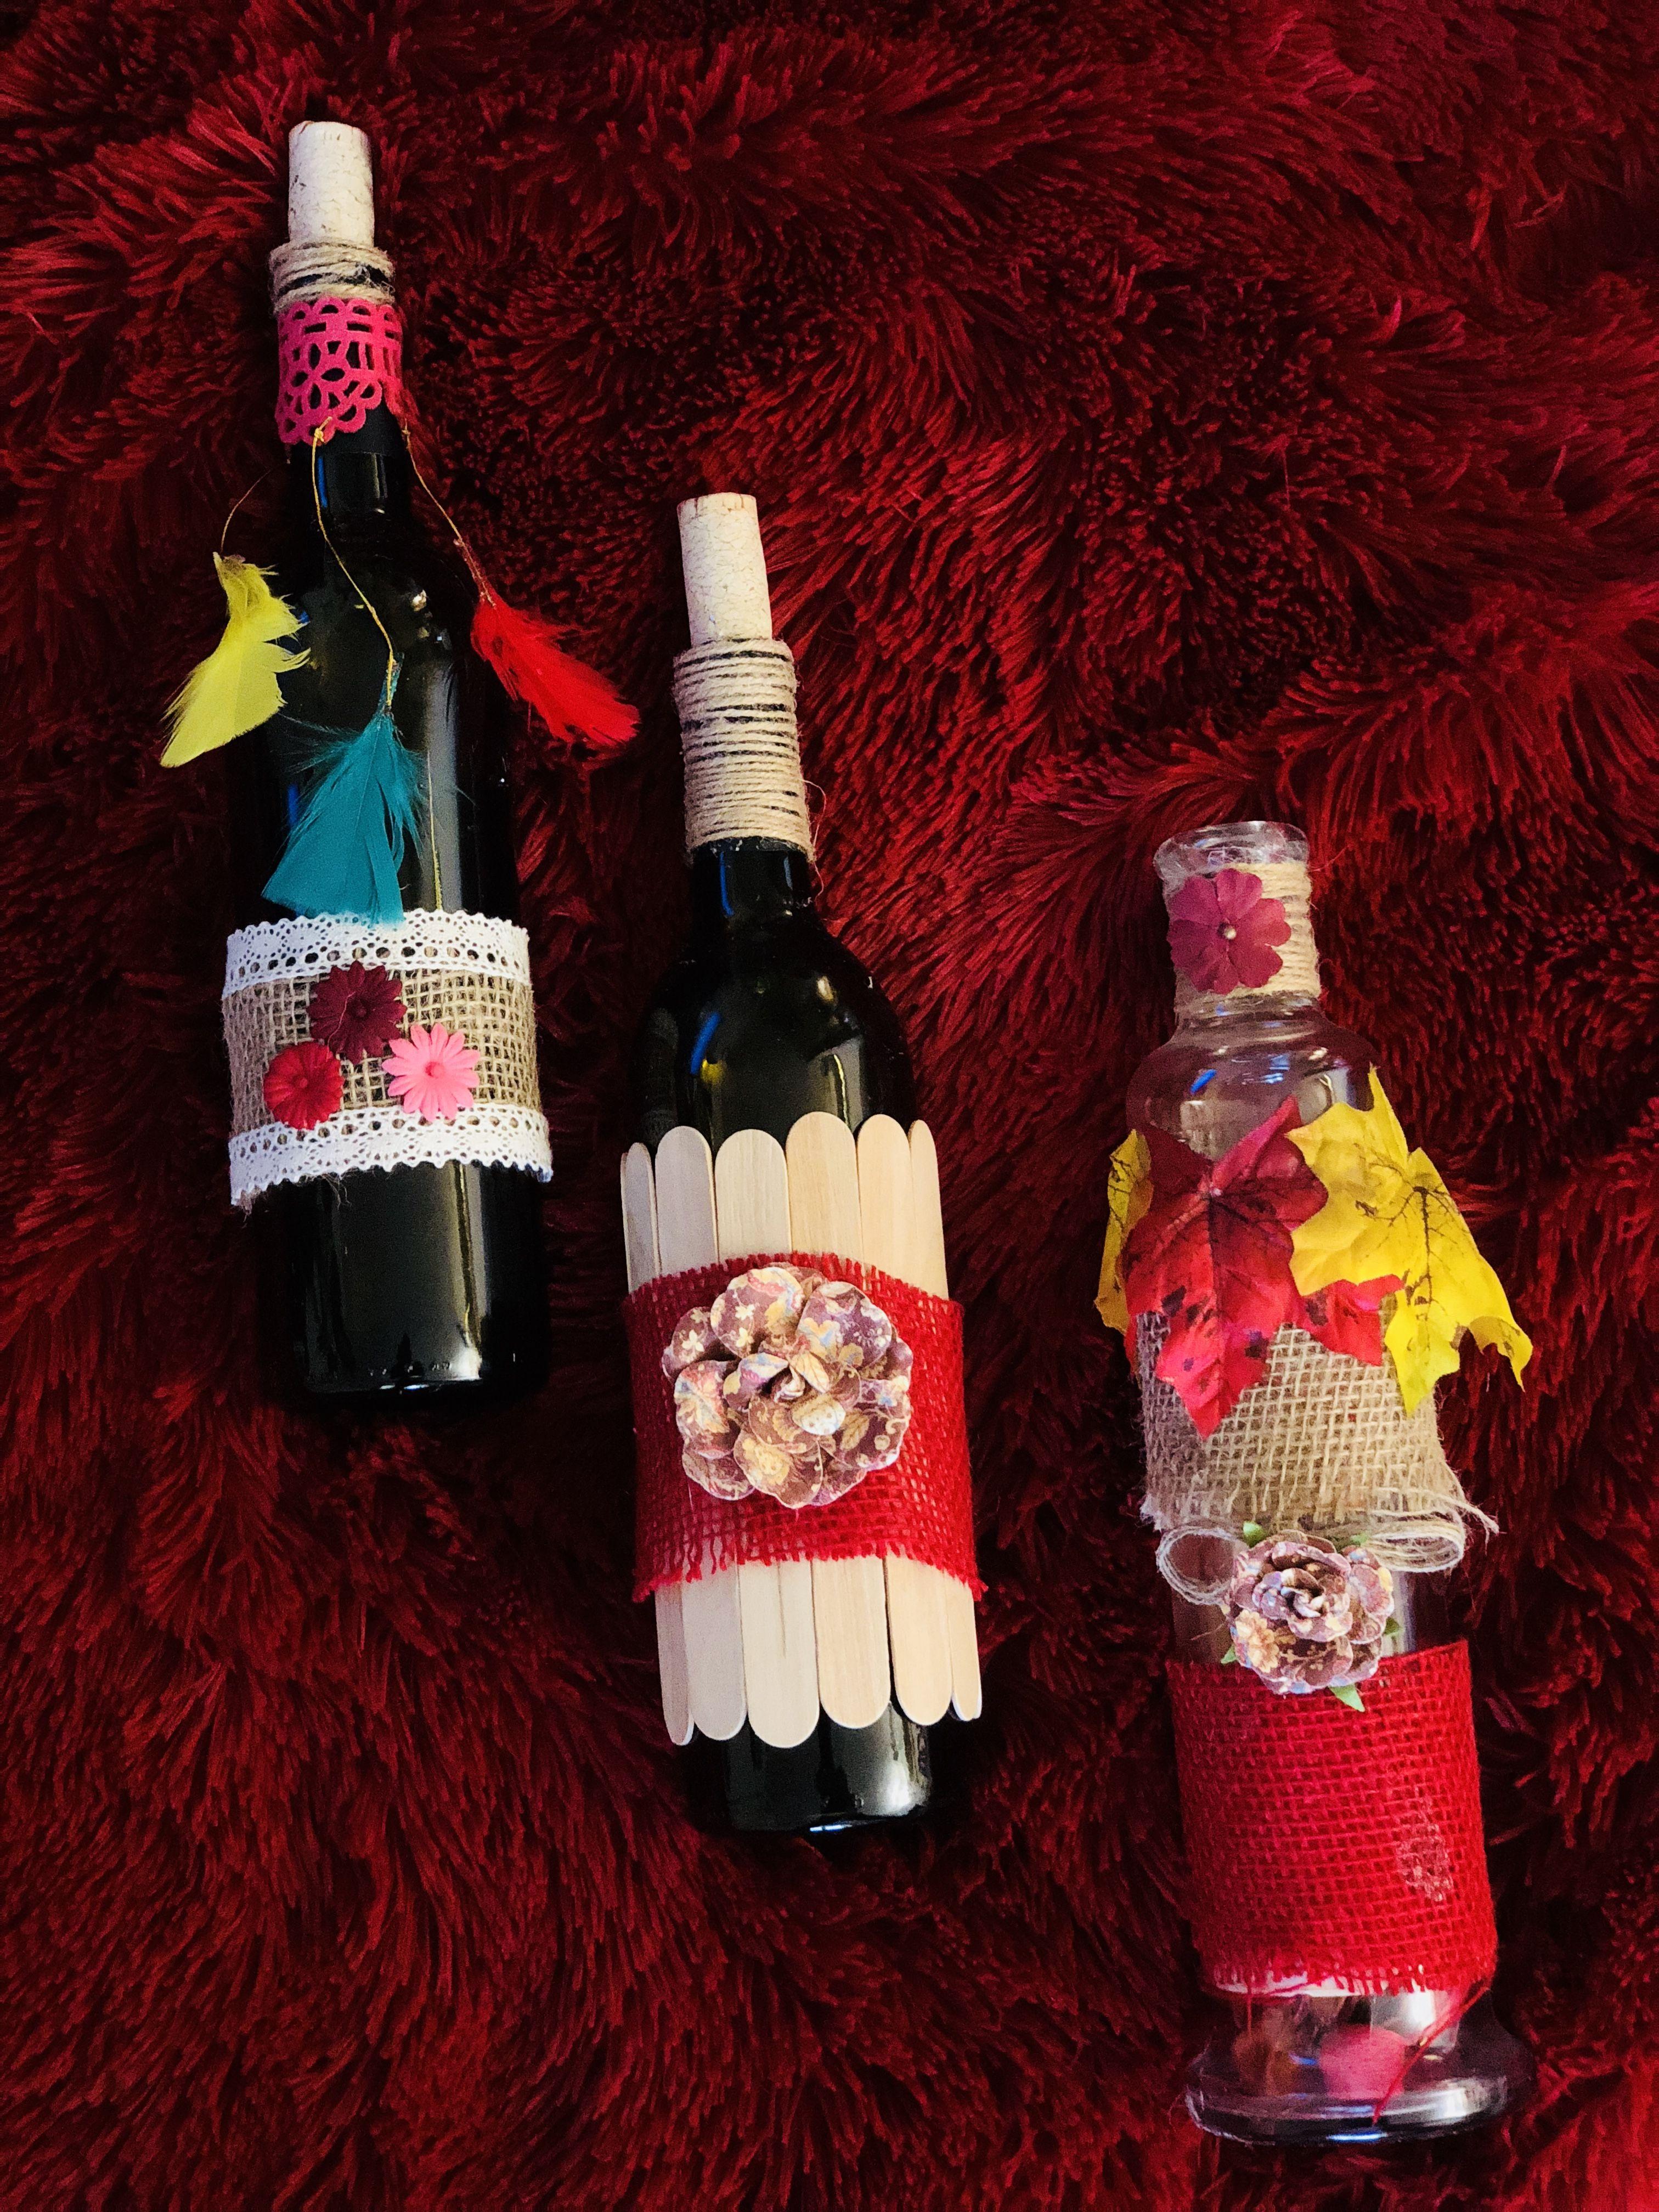 Pin By Kiran Sharma On Rabtbykiran Bottles Decoration Crafts Decor